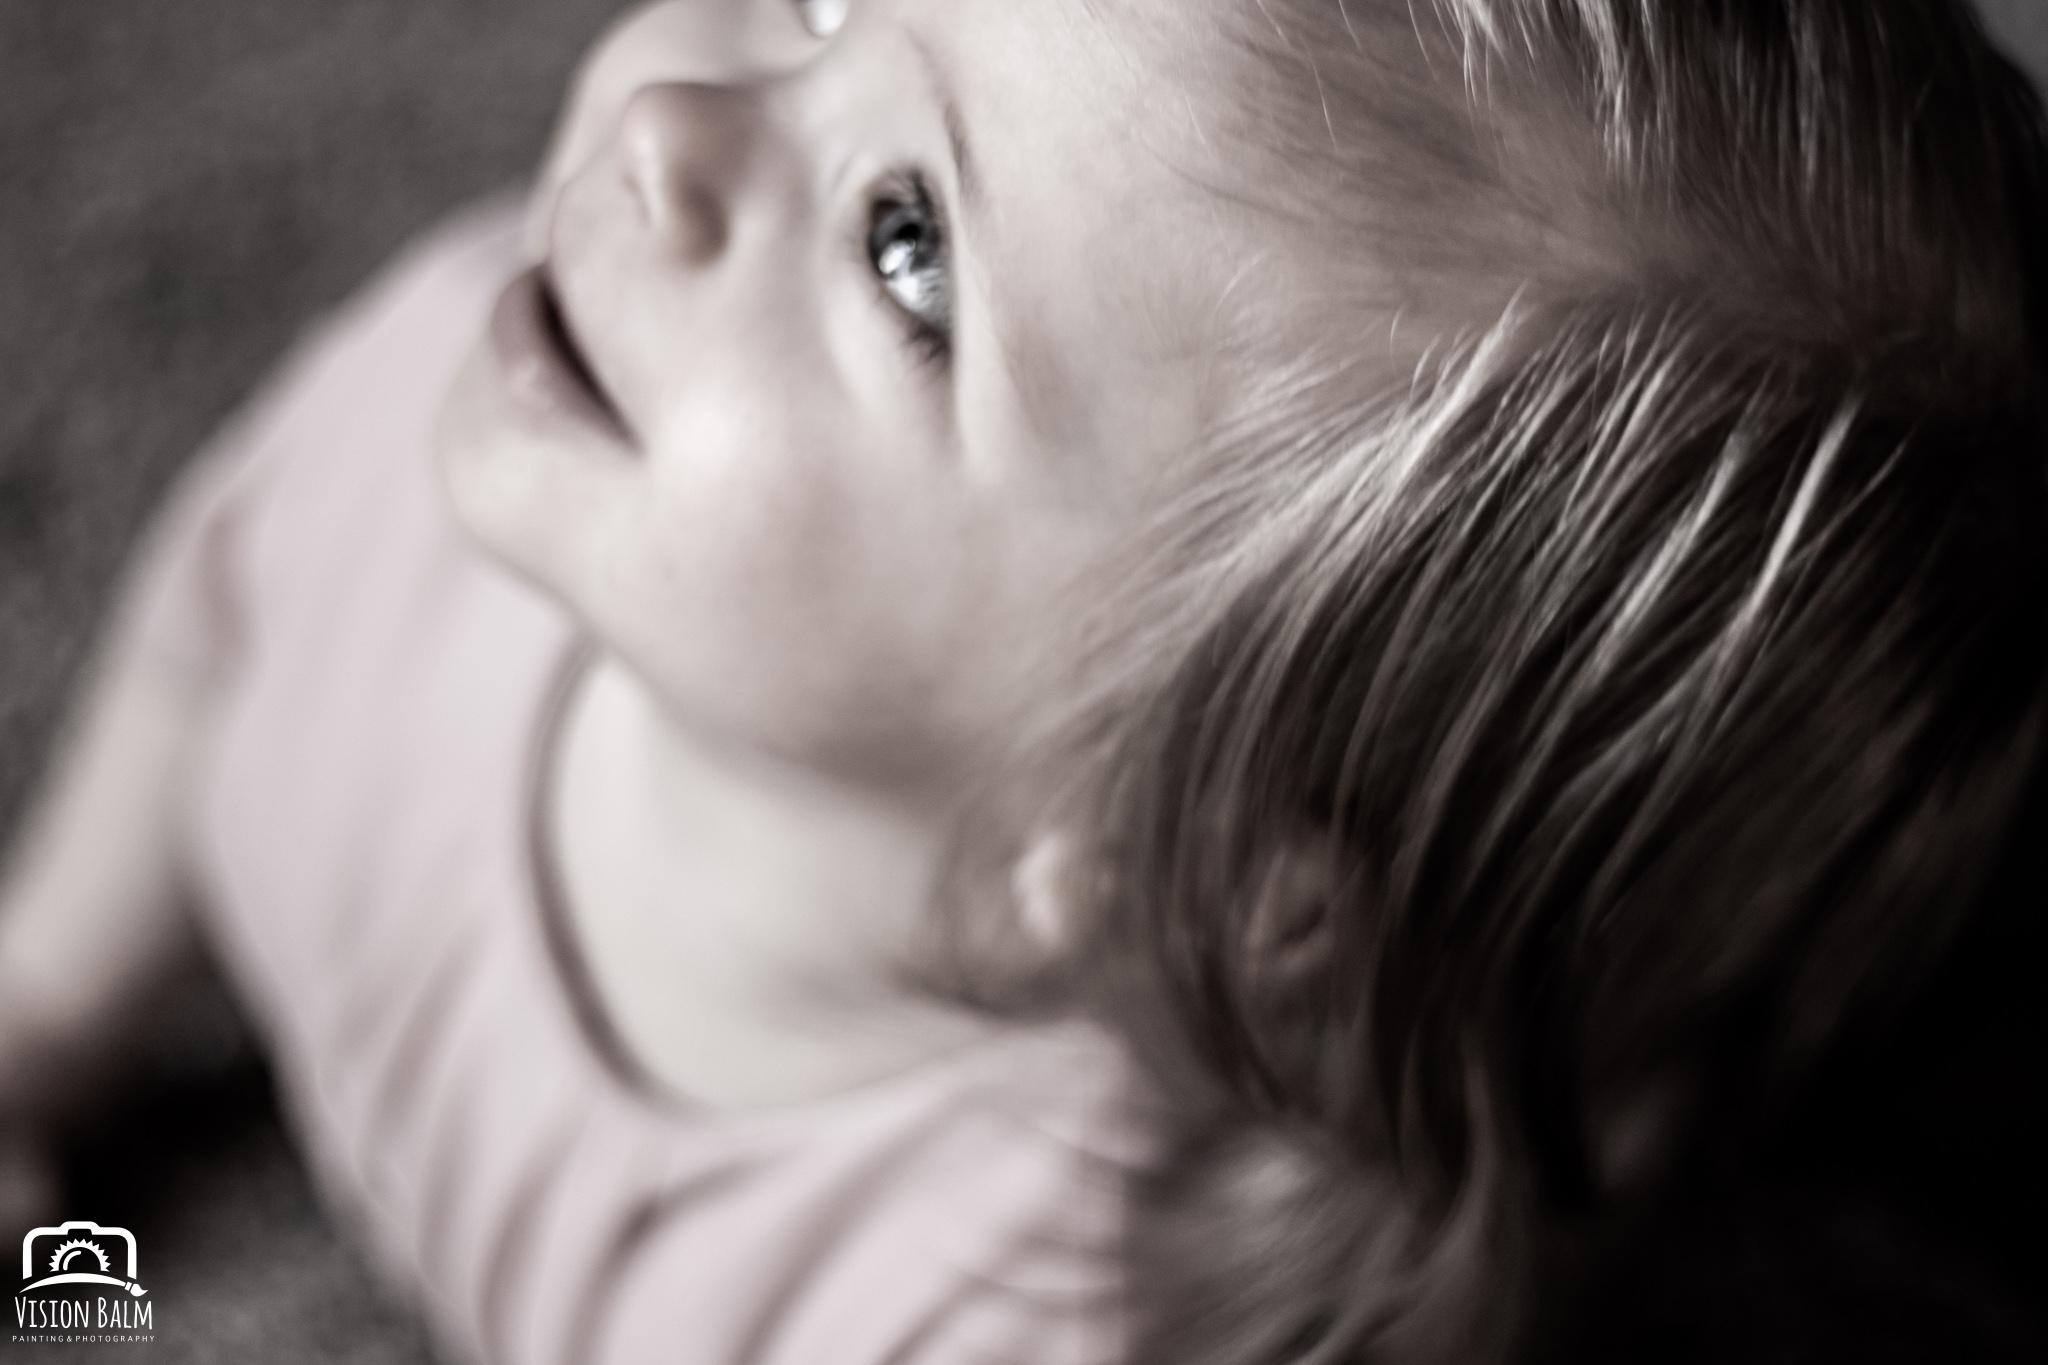 Lifestyle portrait of baby girl in Zuka's Hilltop Barn by Vision Balm in Charleston, SC.